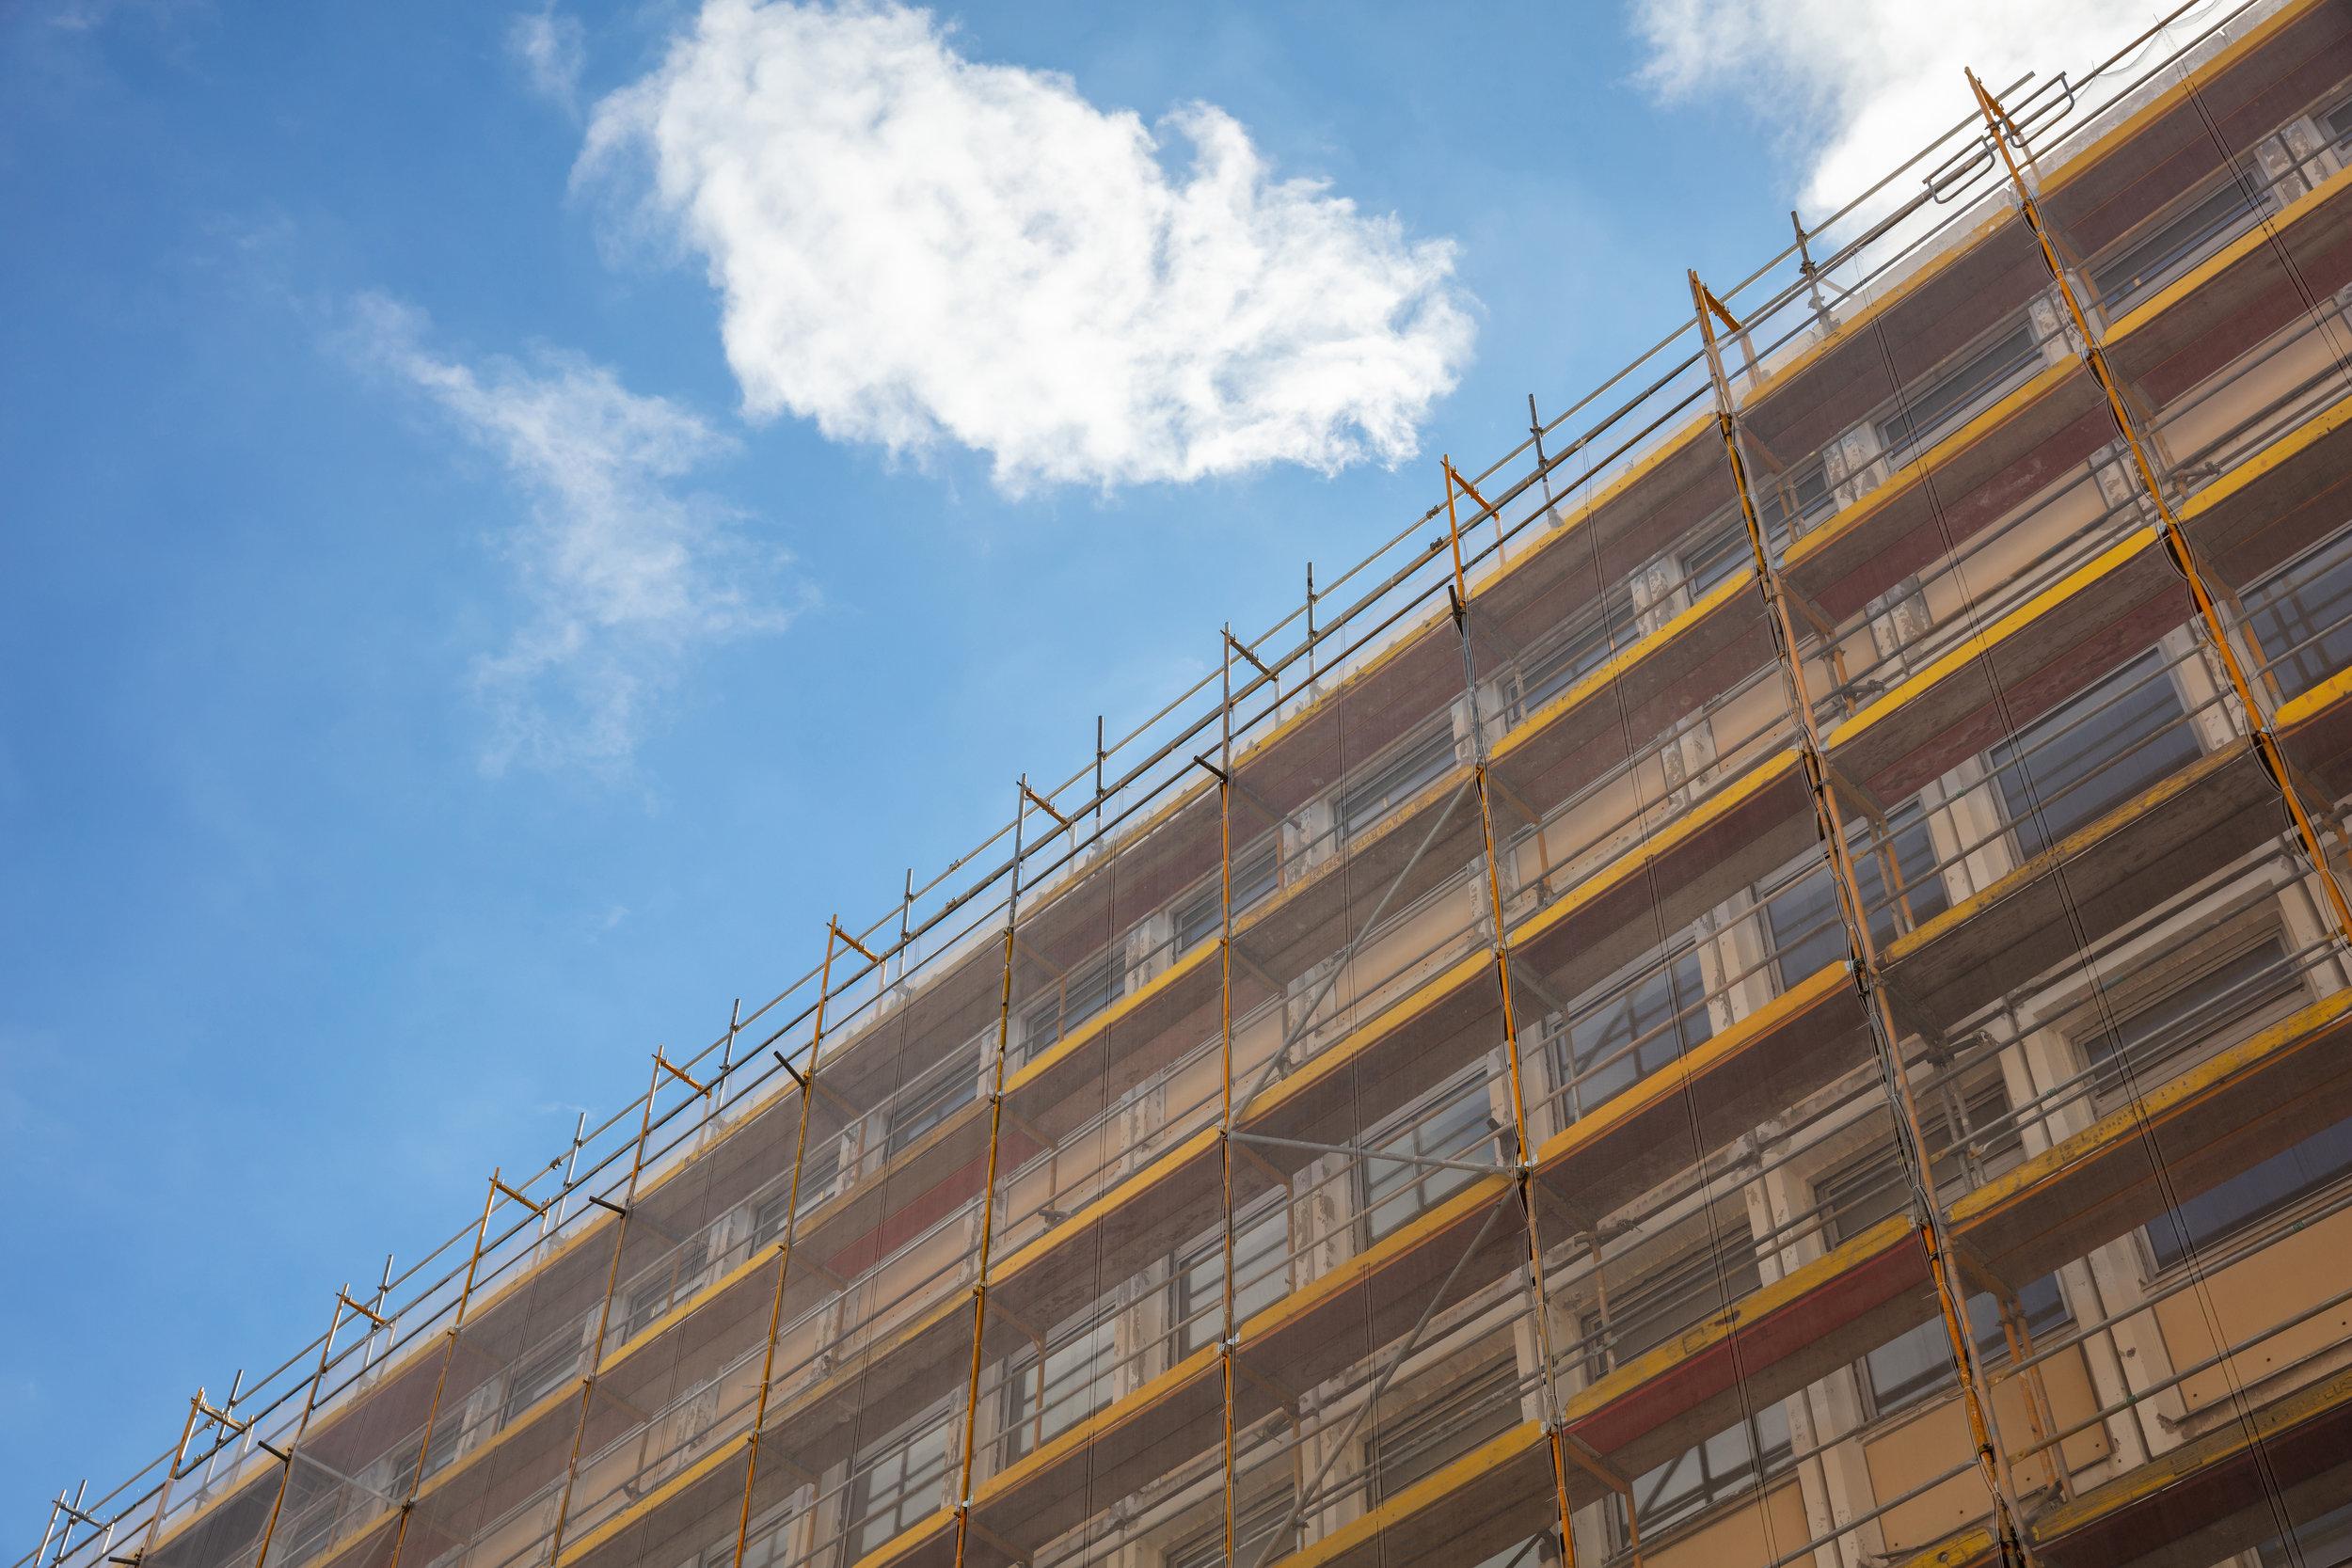 building-construction-with-scaffolding-blue-sky-B57P8X4.jpg